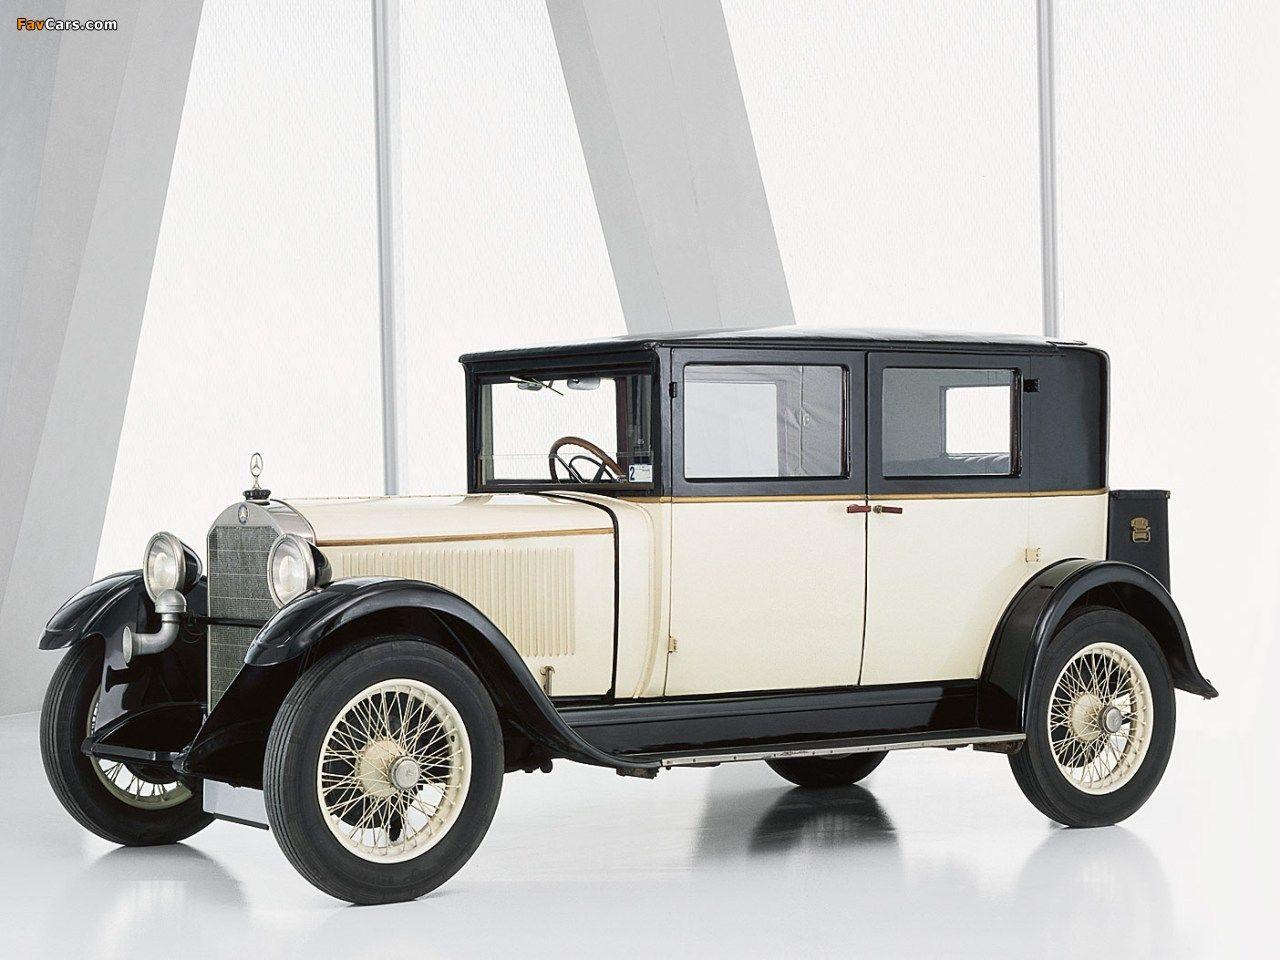 Mercedes-Benz 8/38 HP (W02) 1926-36 photos (1280x960 ...